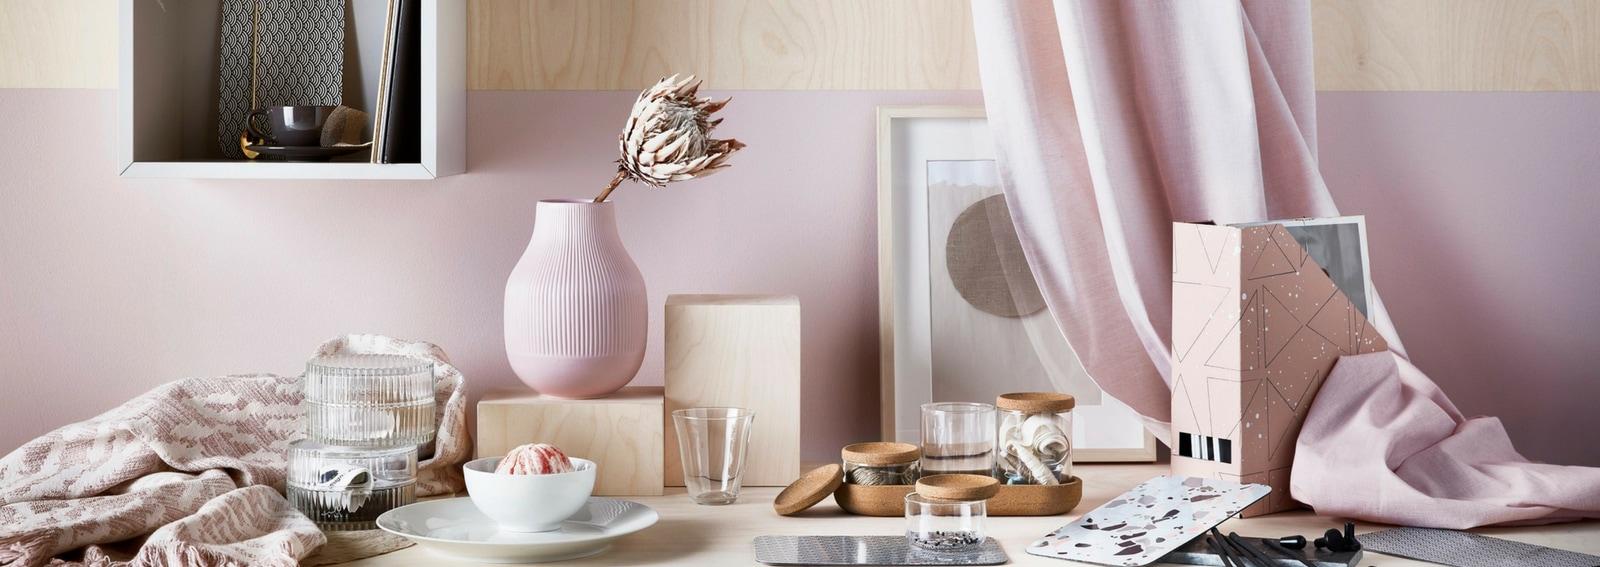 IKEA 2019 desktop